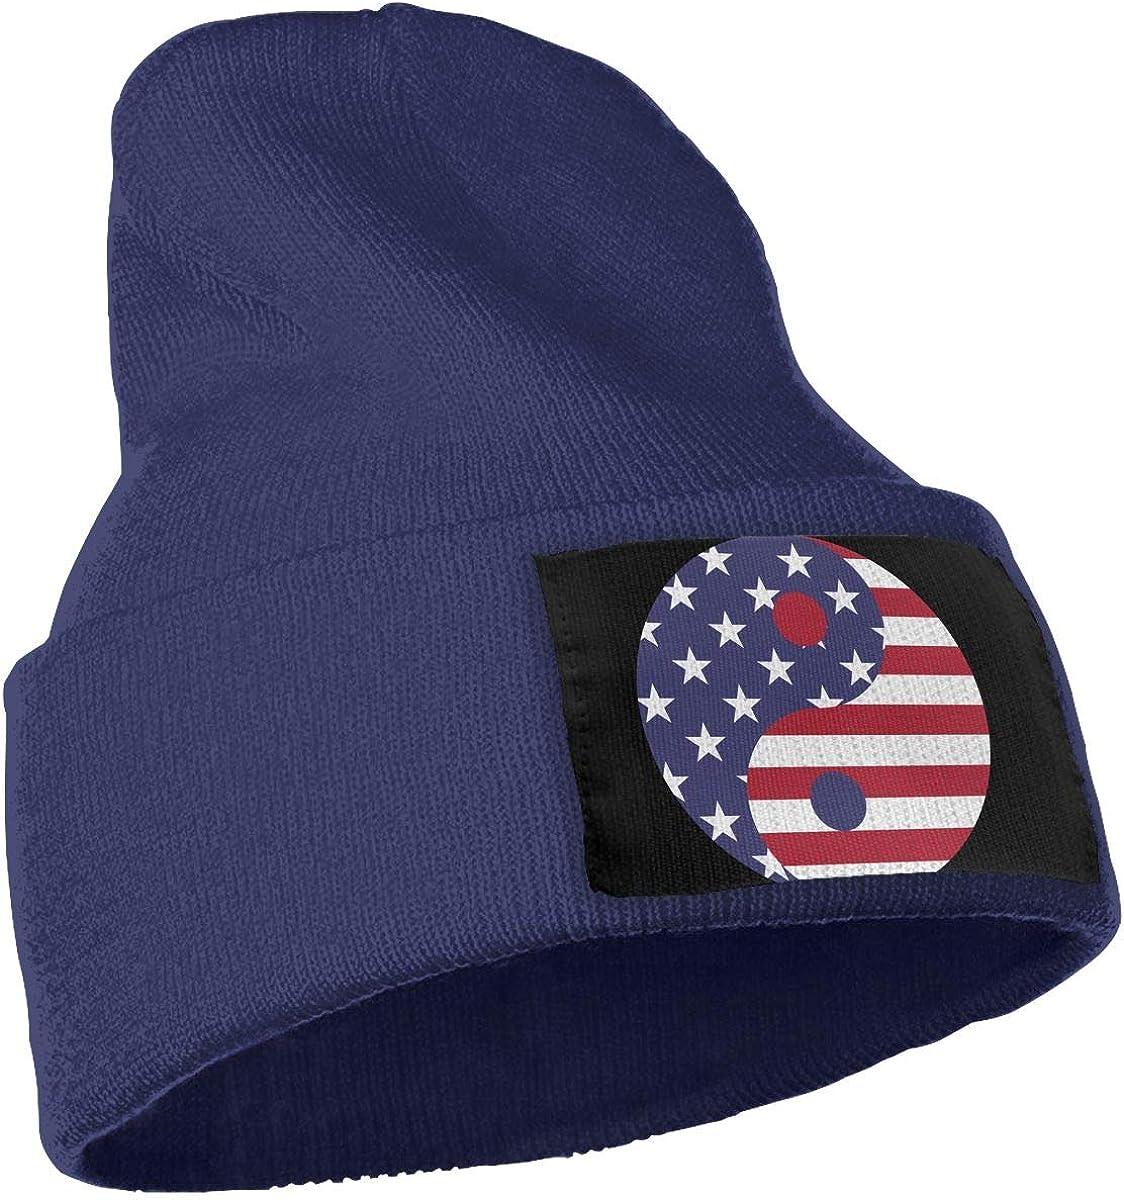 American Flag Yin Yang Unisex Fashion Knitted Hat Luxury Hip-Hop Cap